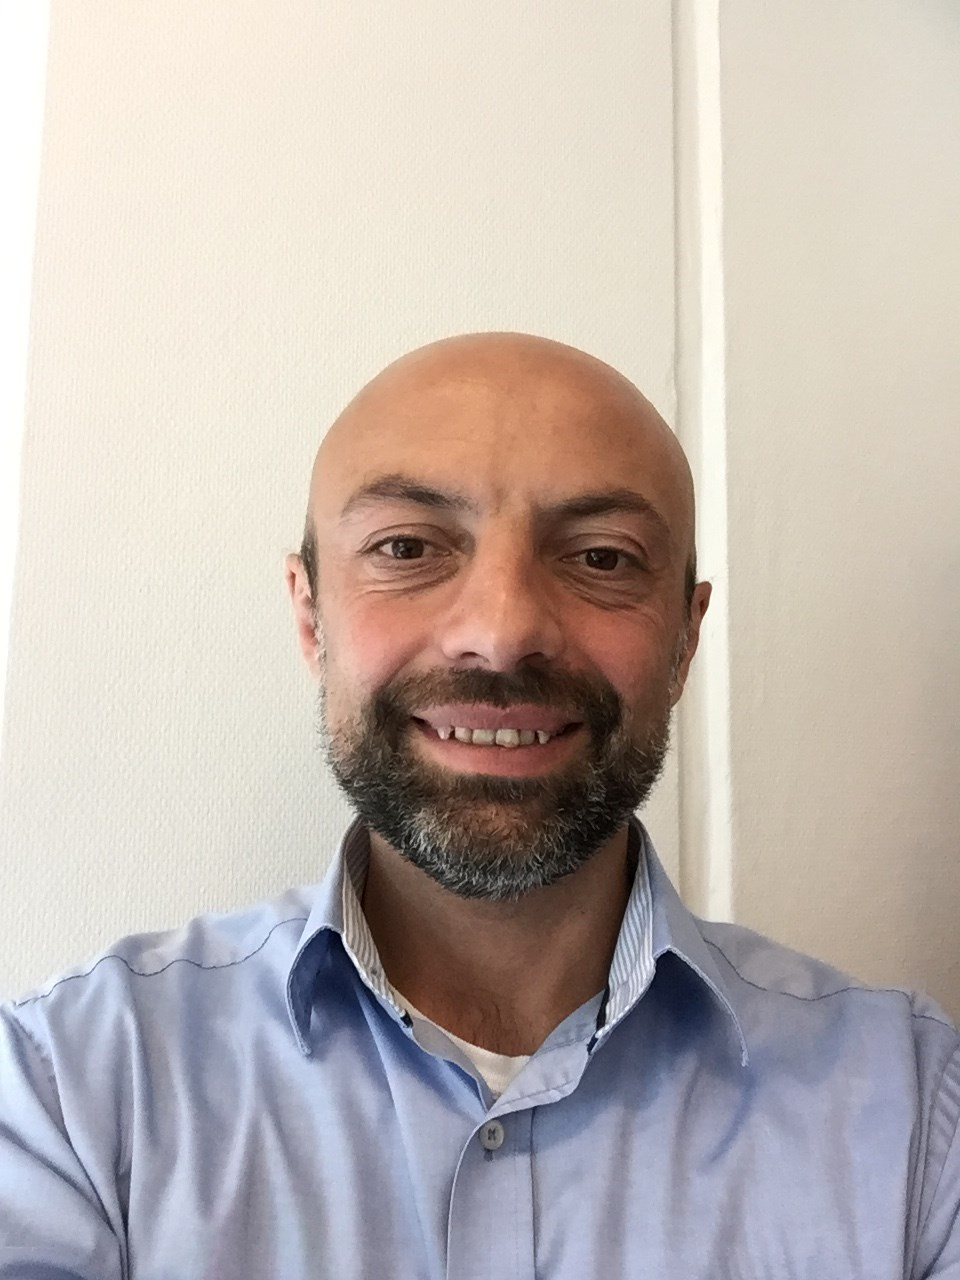 Thomas Hariri